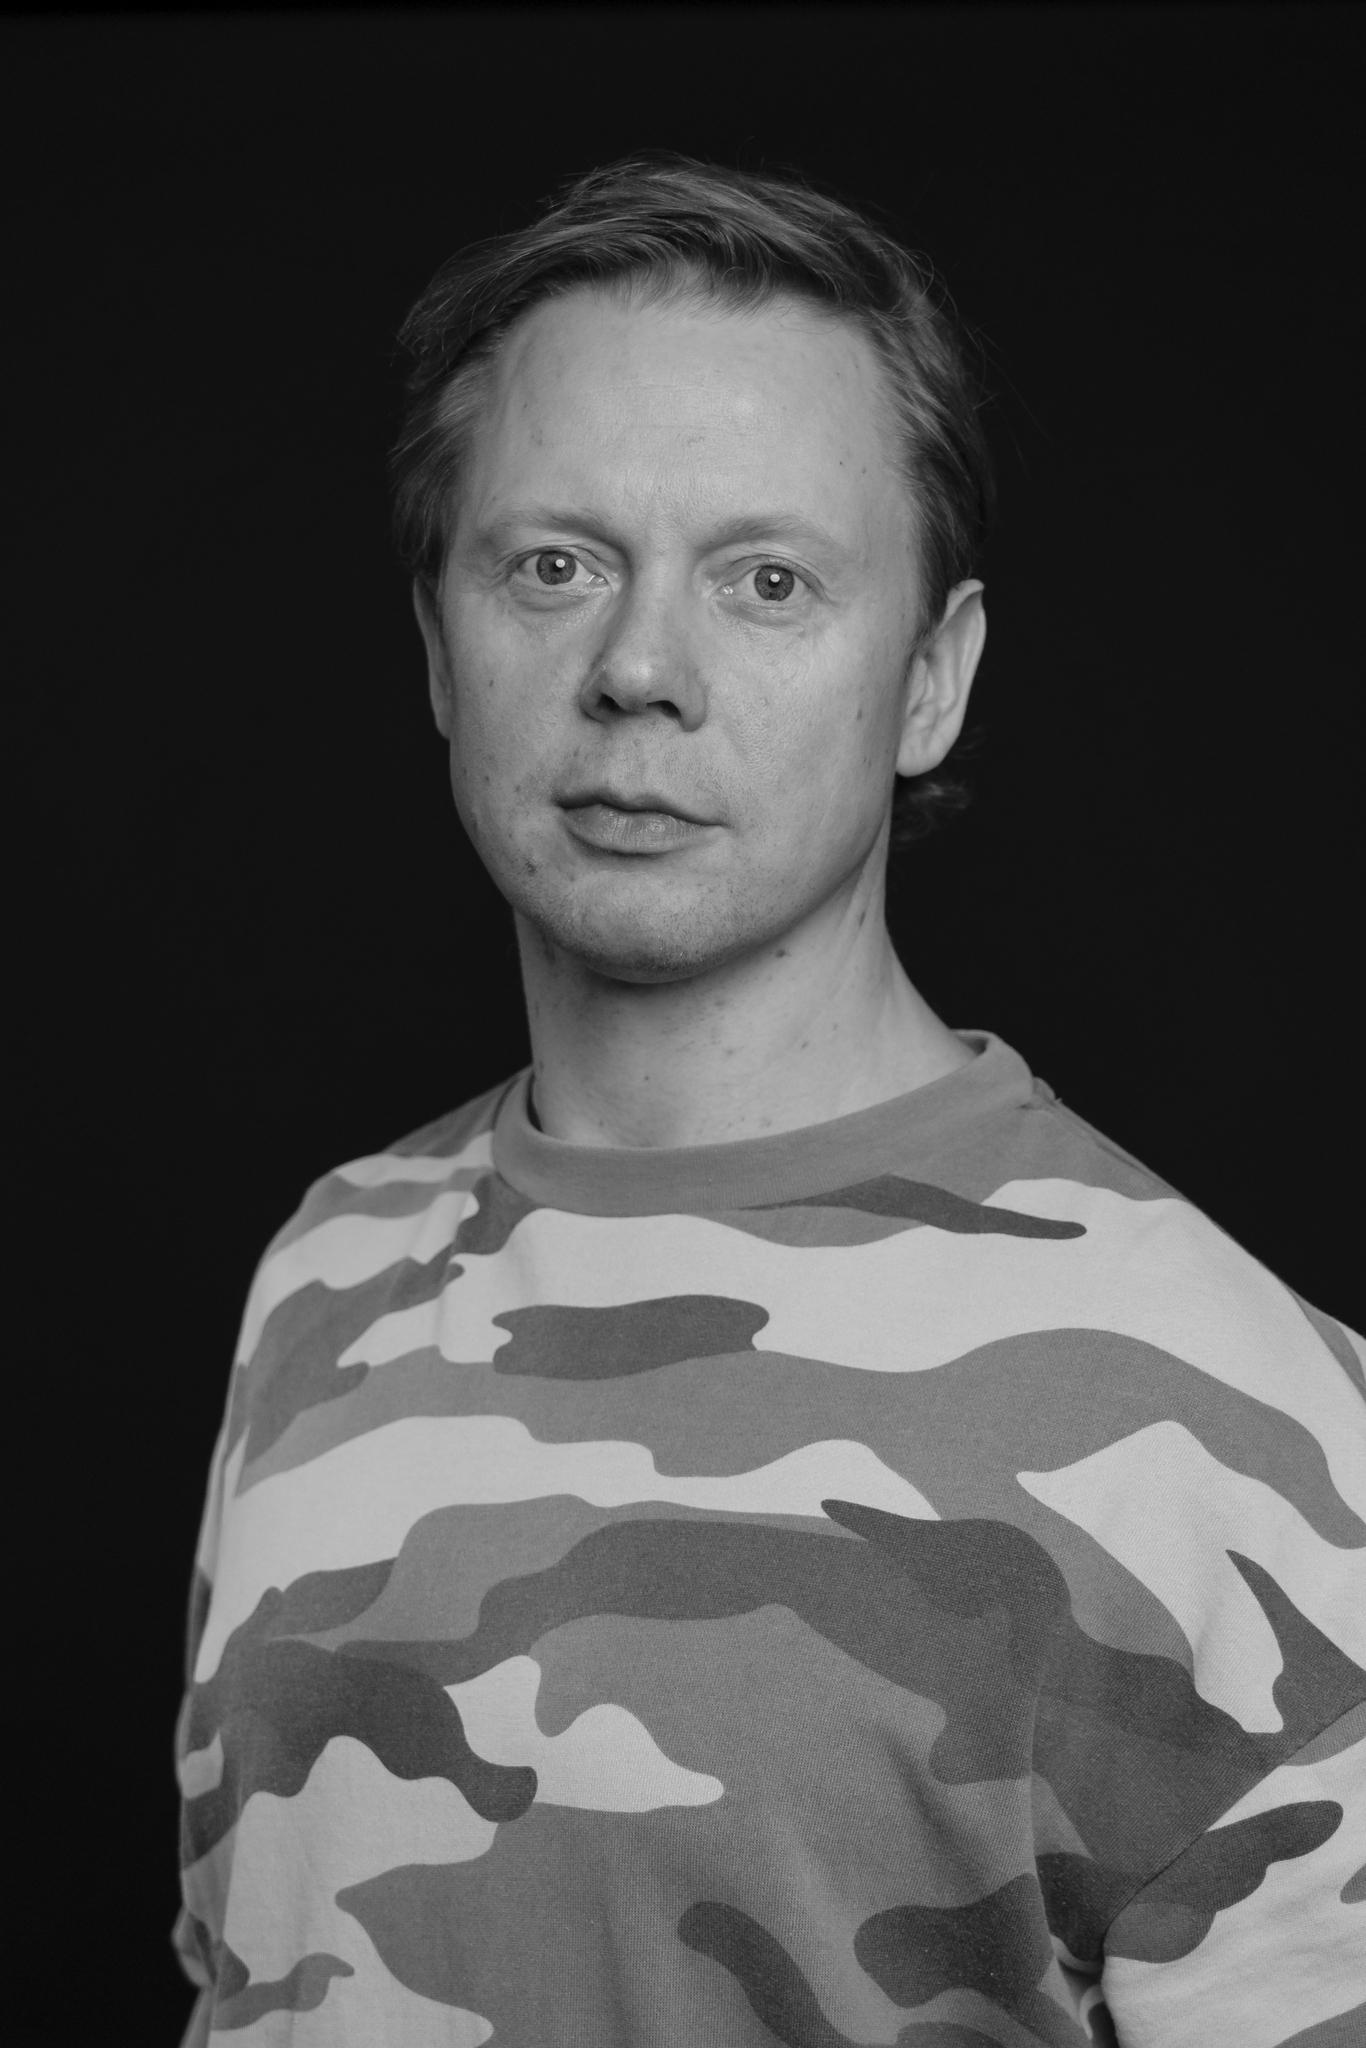 Nils Lausund image 1